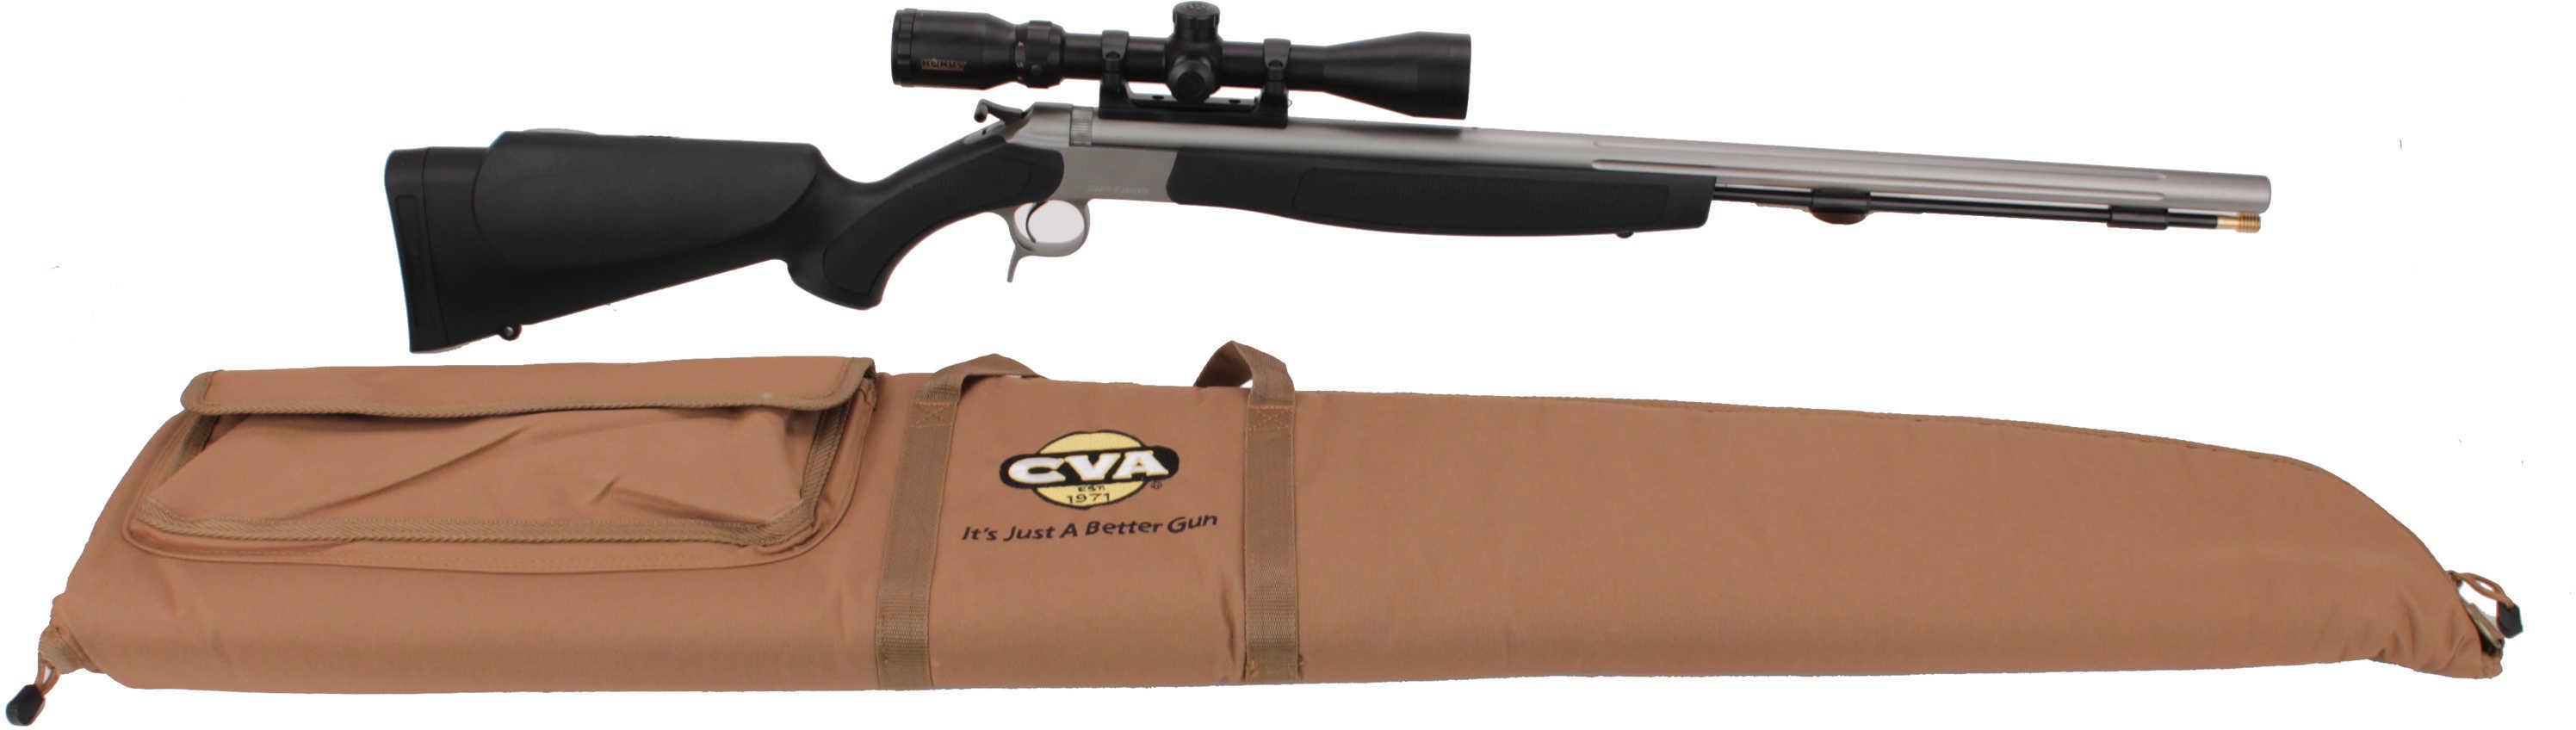 CVA Optima V2 Stainless Steel/Black 50 Caliber w/Konus Pro Scope PR2020SSC